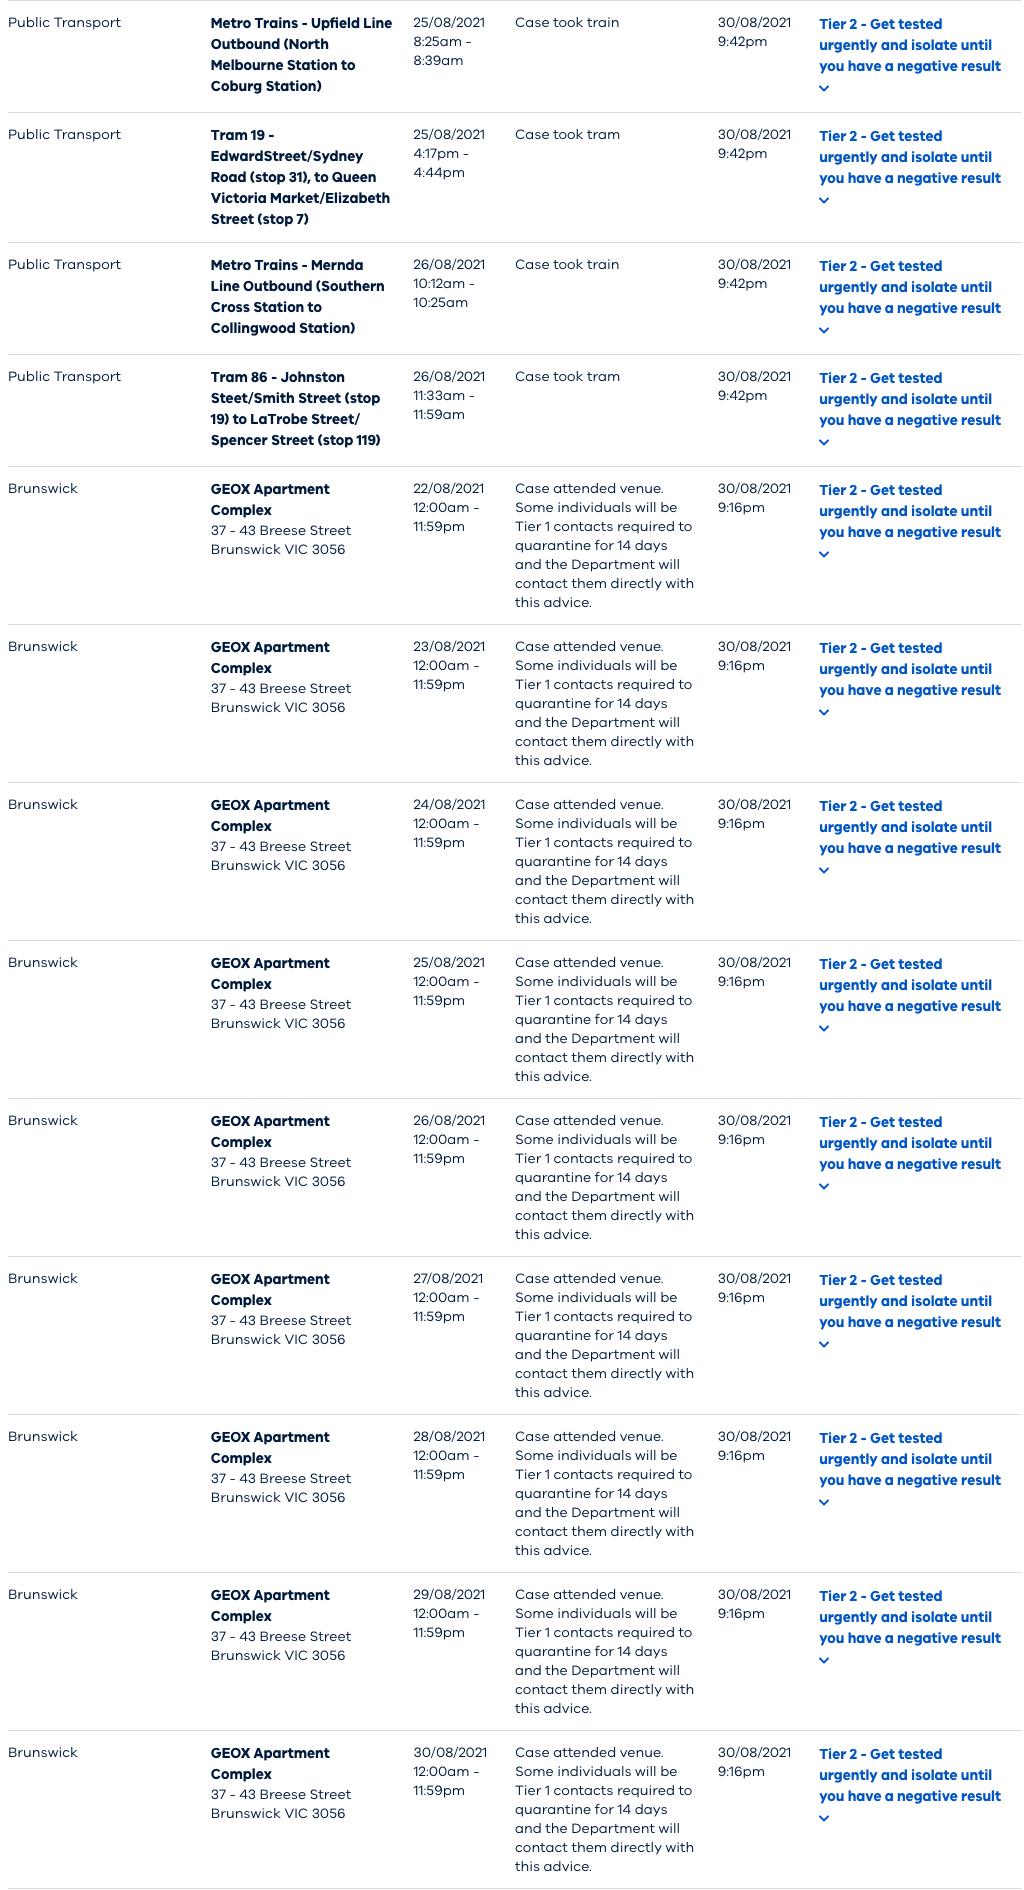 www.coronavirus.vic.gov.au_exposure-sites (25).png